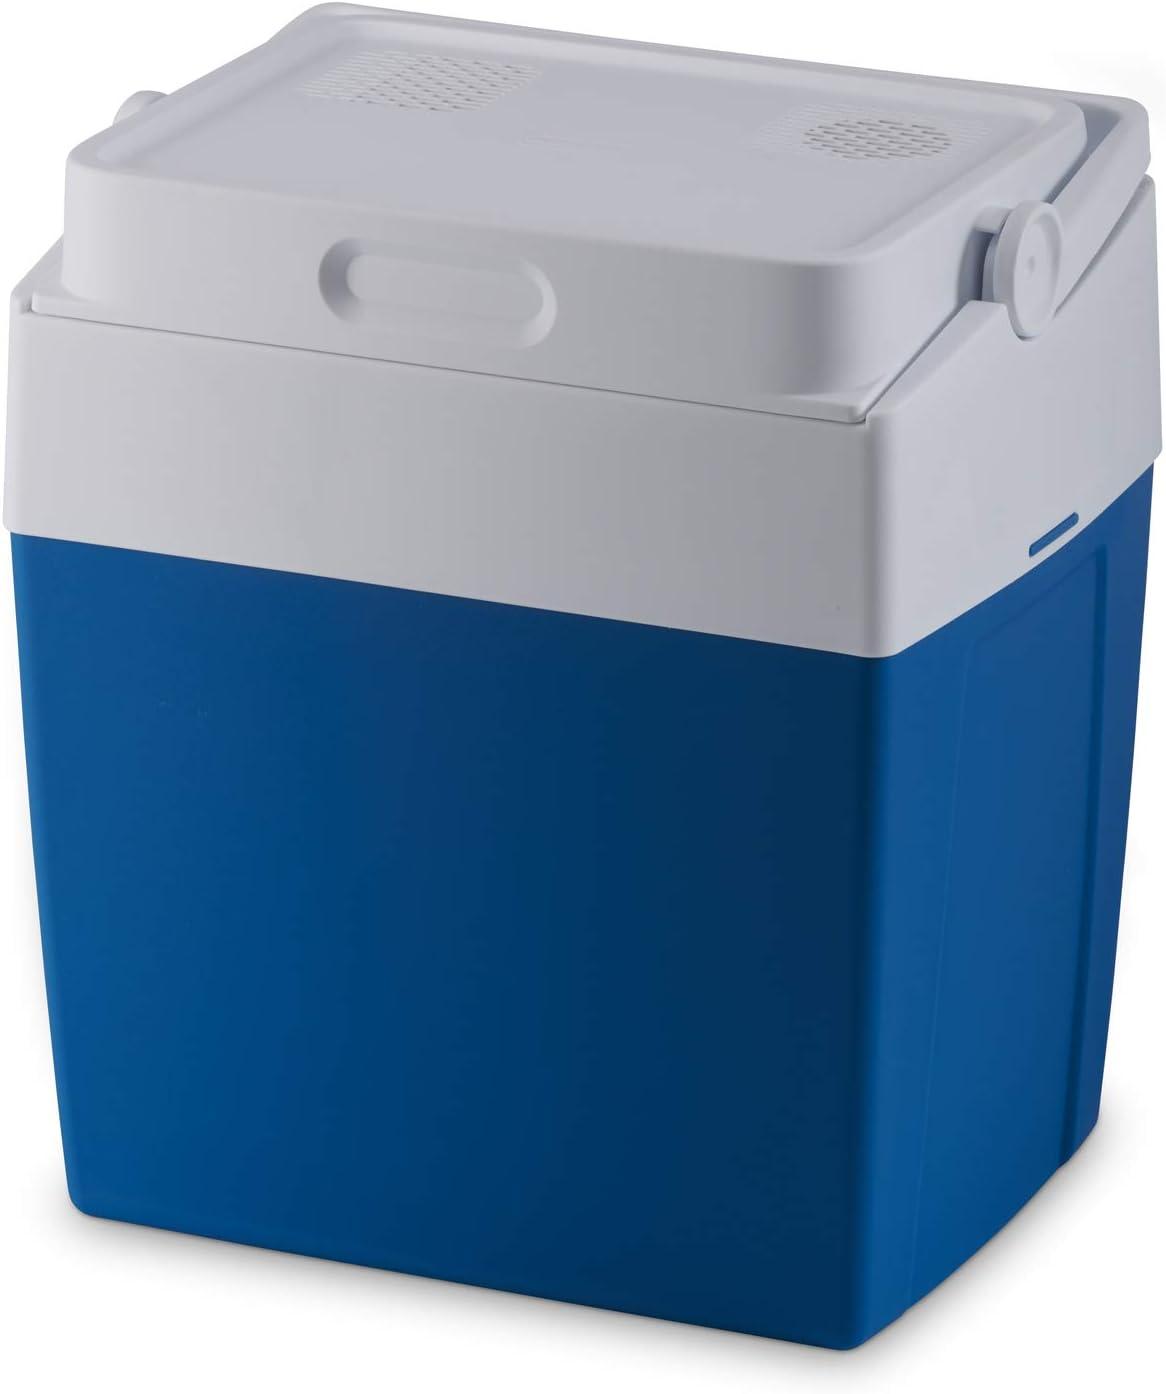 Mobicool 9600024972 Nevera portátil, Azul, 29 Liter